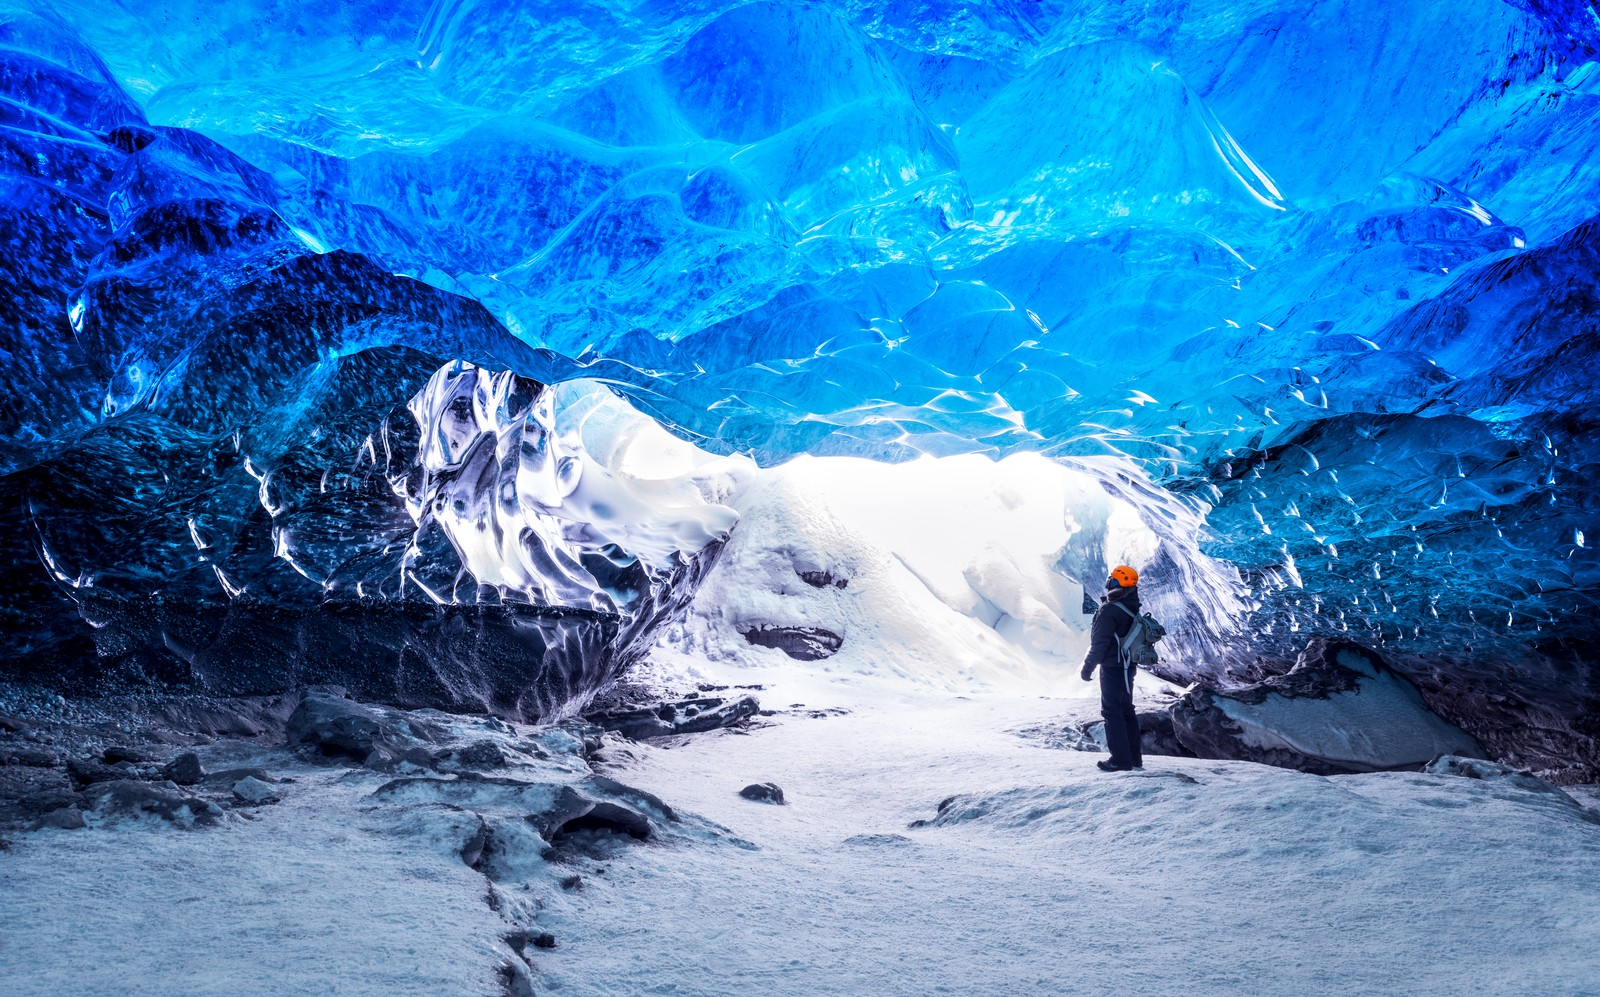 Ice caves of Skaftafellsjökull